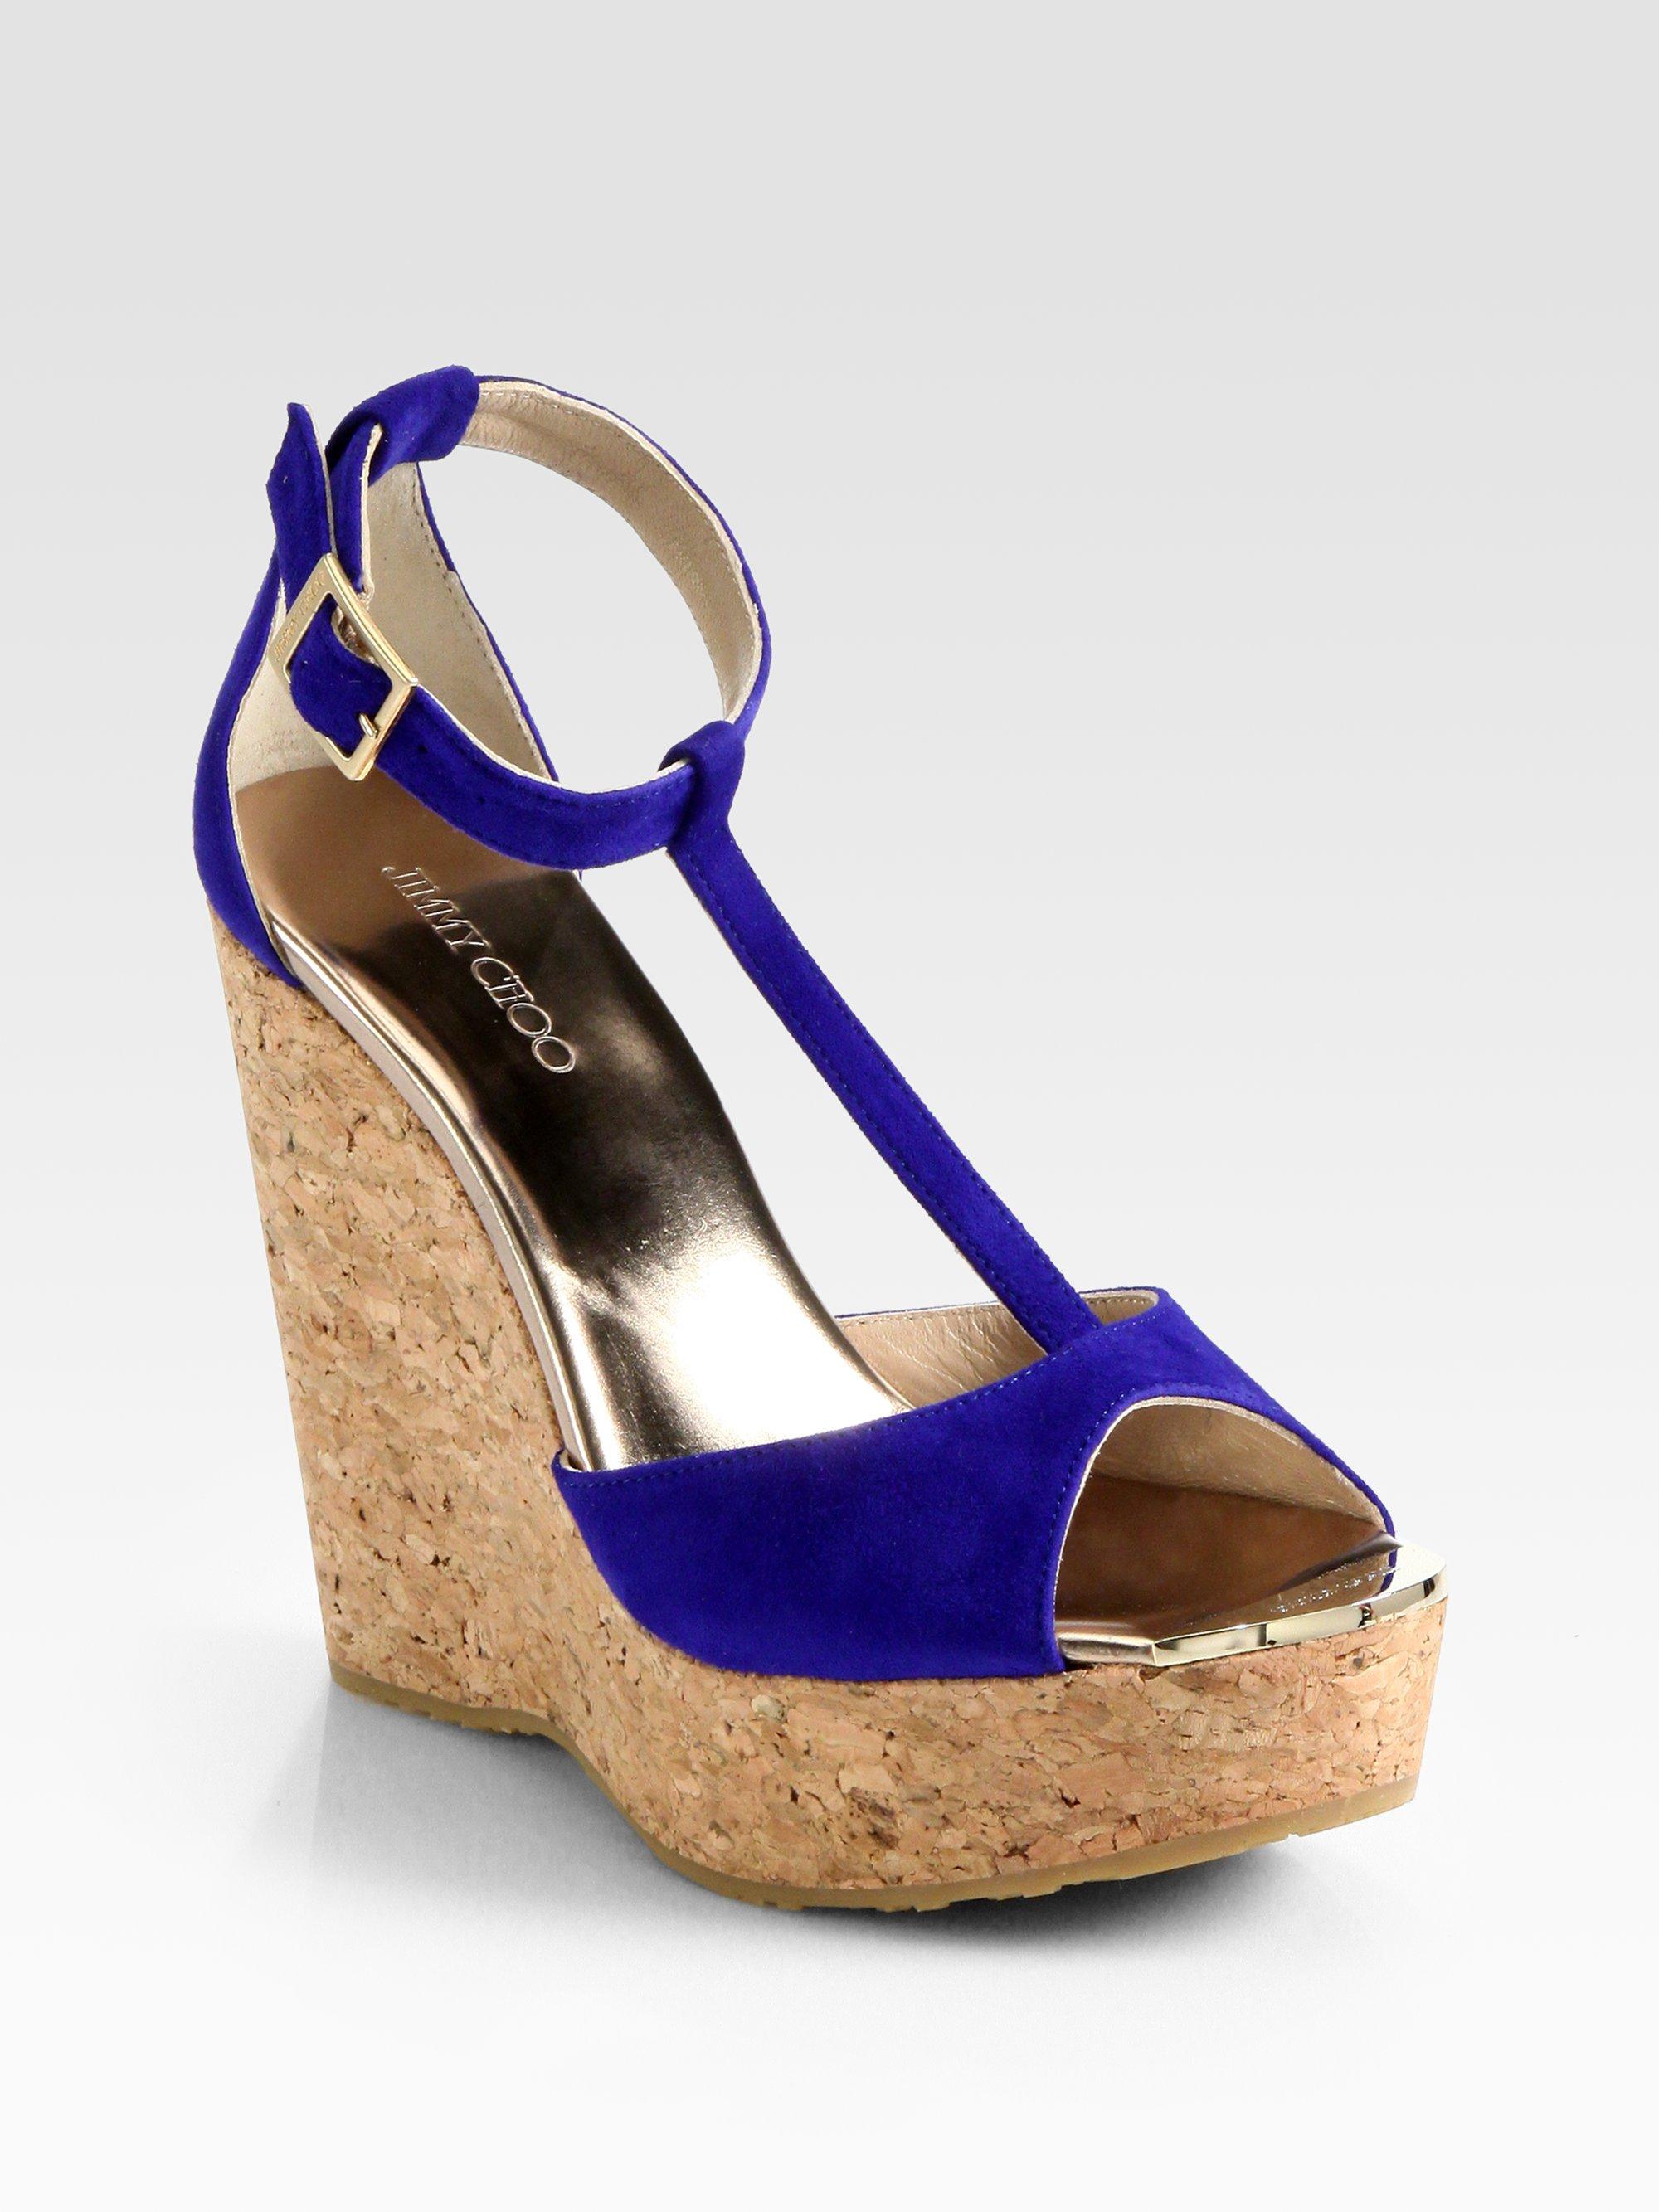 jimmy-choo-navy-blue-pela-suede-tstrap-cork-wedge-sandals-product-1-7708907-167884056.jpeg